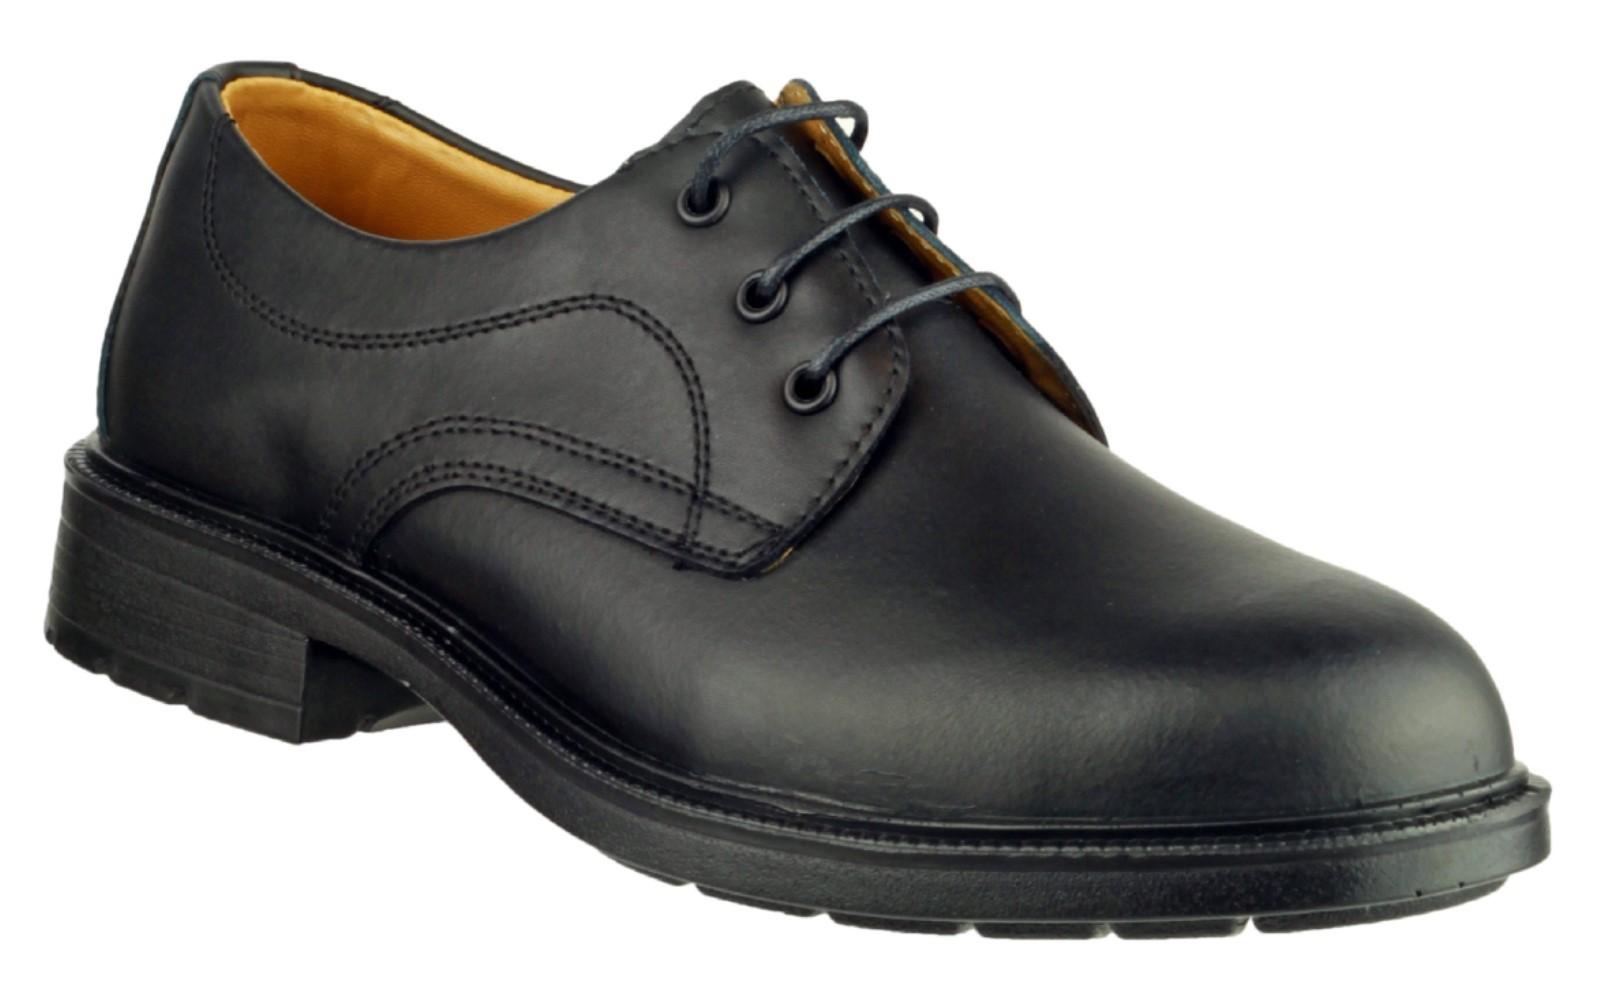 Amblers Black S1 Safety Shoes FS45